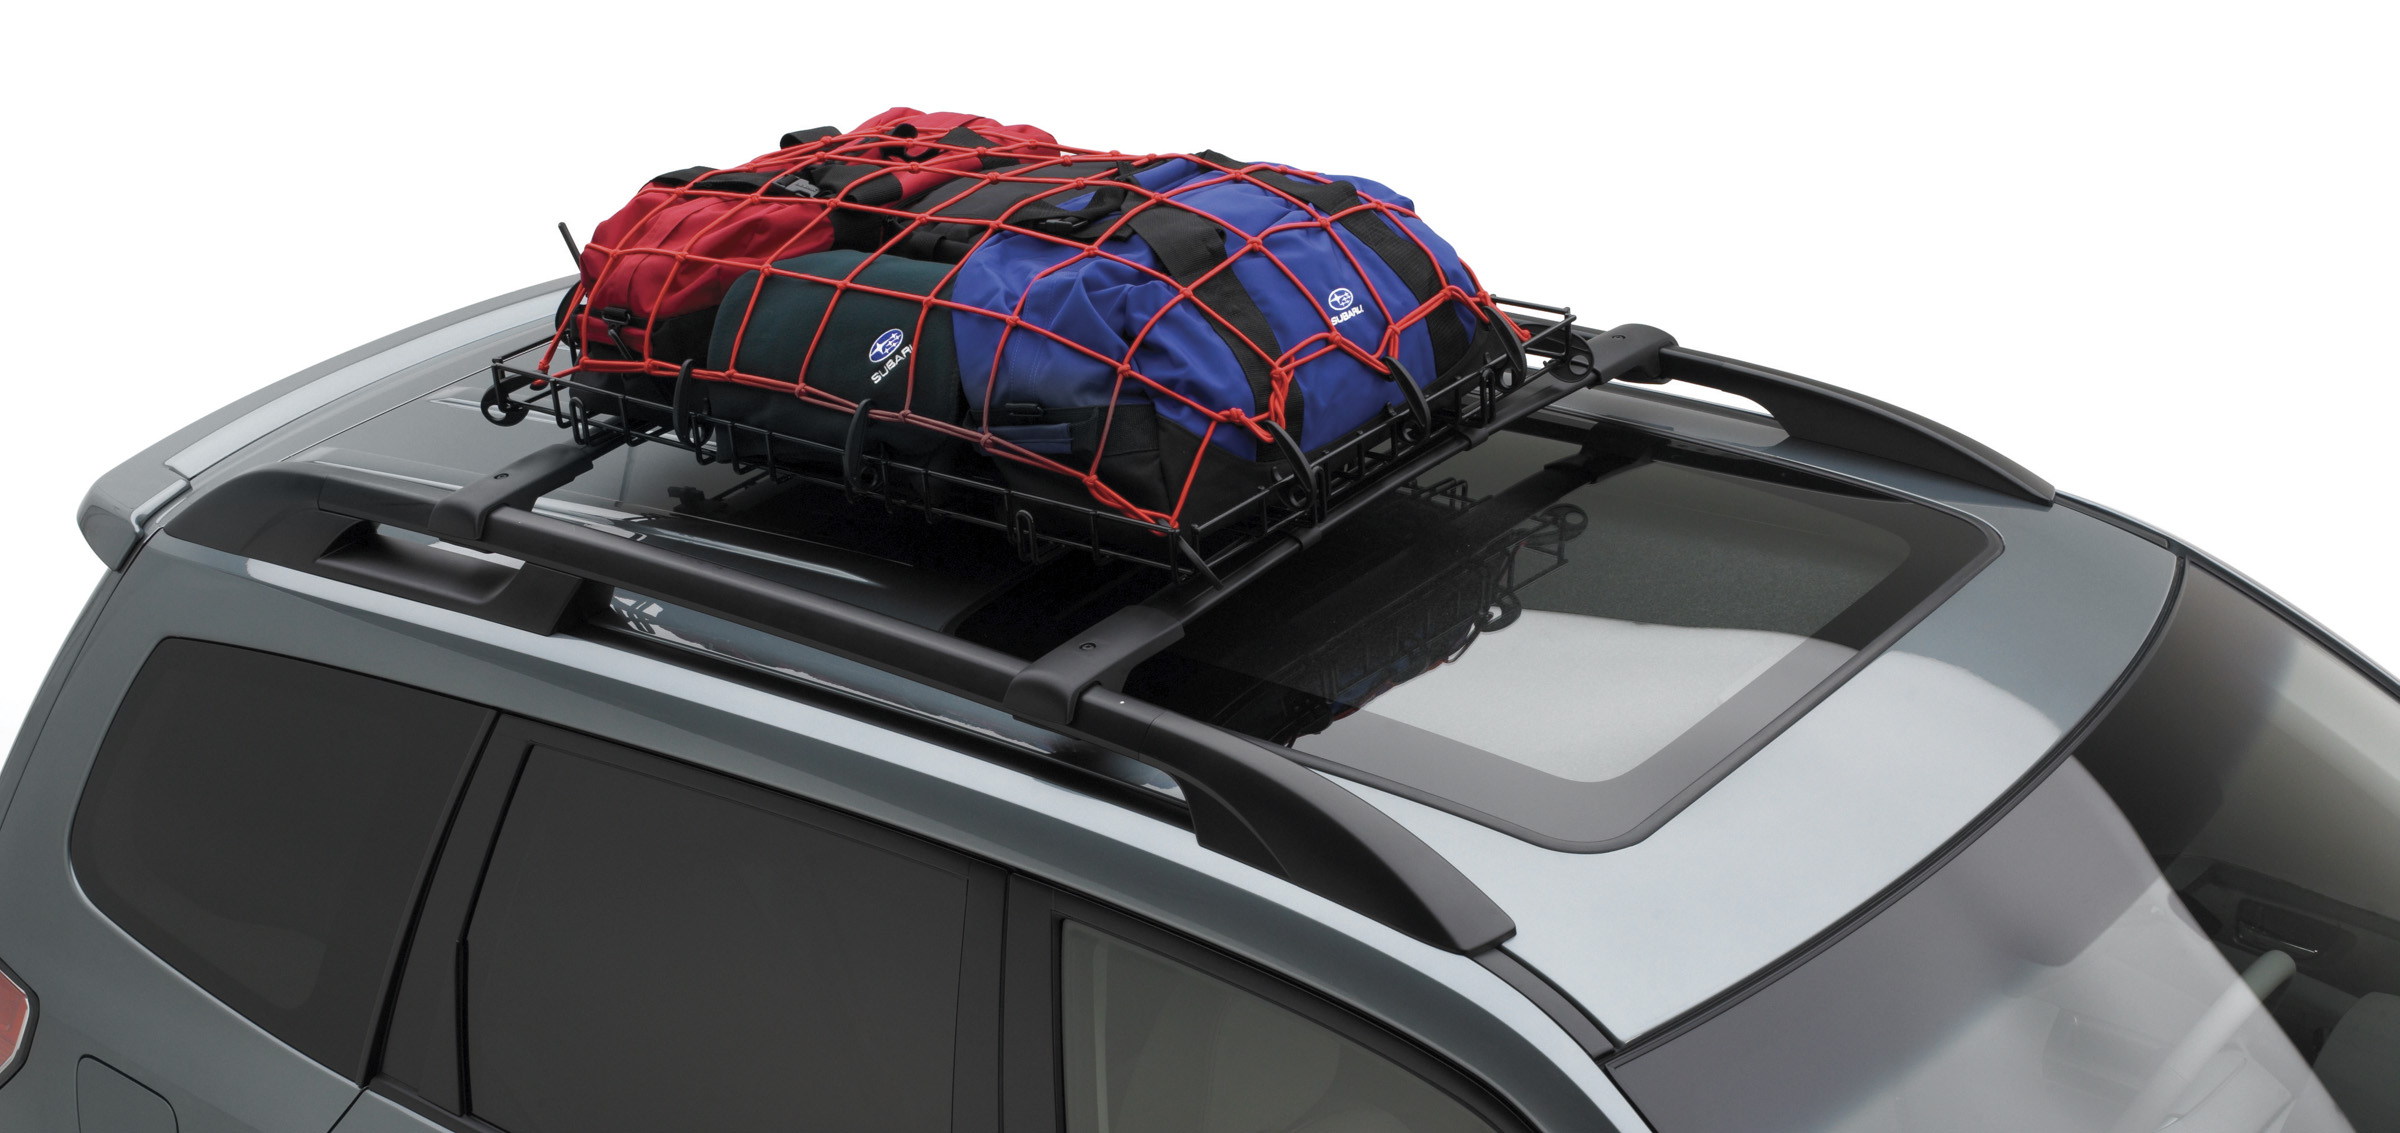 2009 subaru forester roof cargo basket cargo basket with for Colorado springs motor vehicle registration